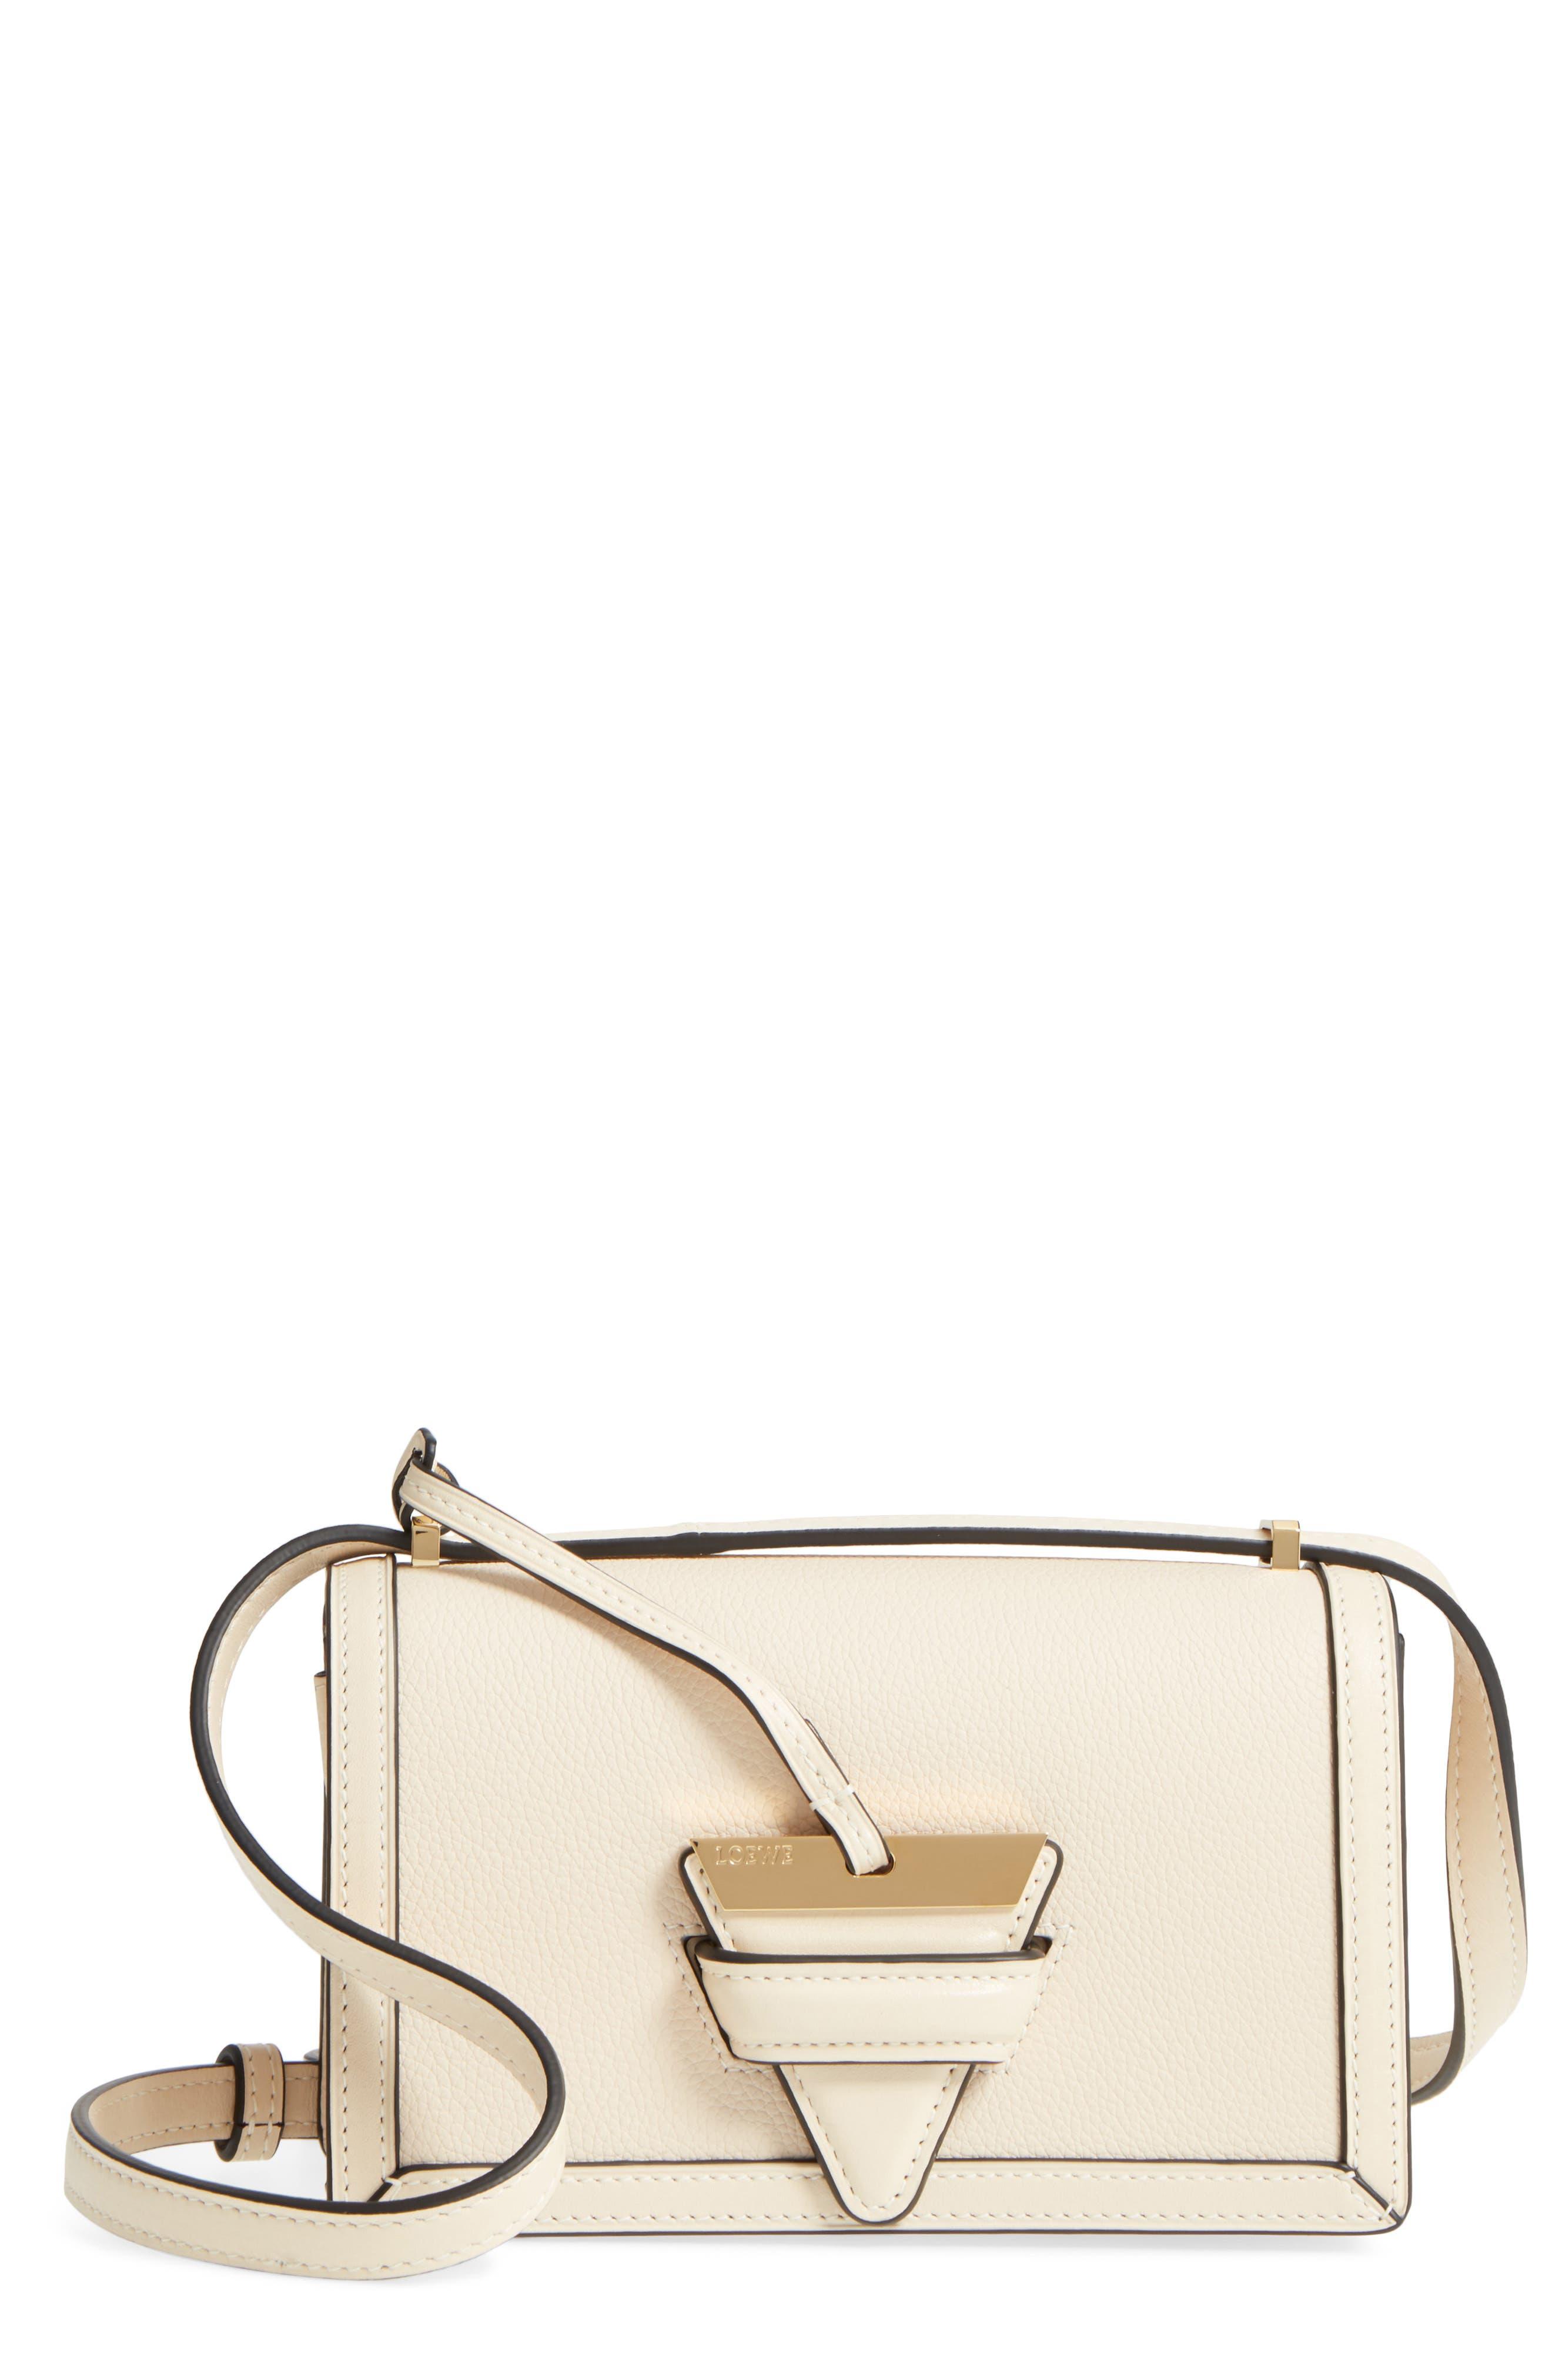 Alternate Image 1 Selected - Loewe Small Barcelona Grainy Leather Crossbody Bag